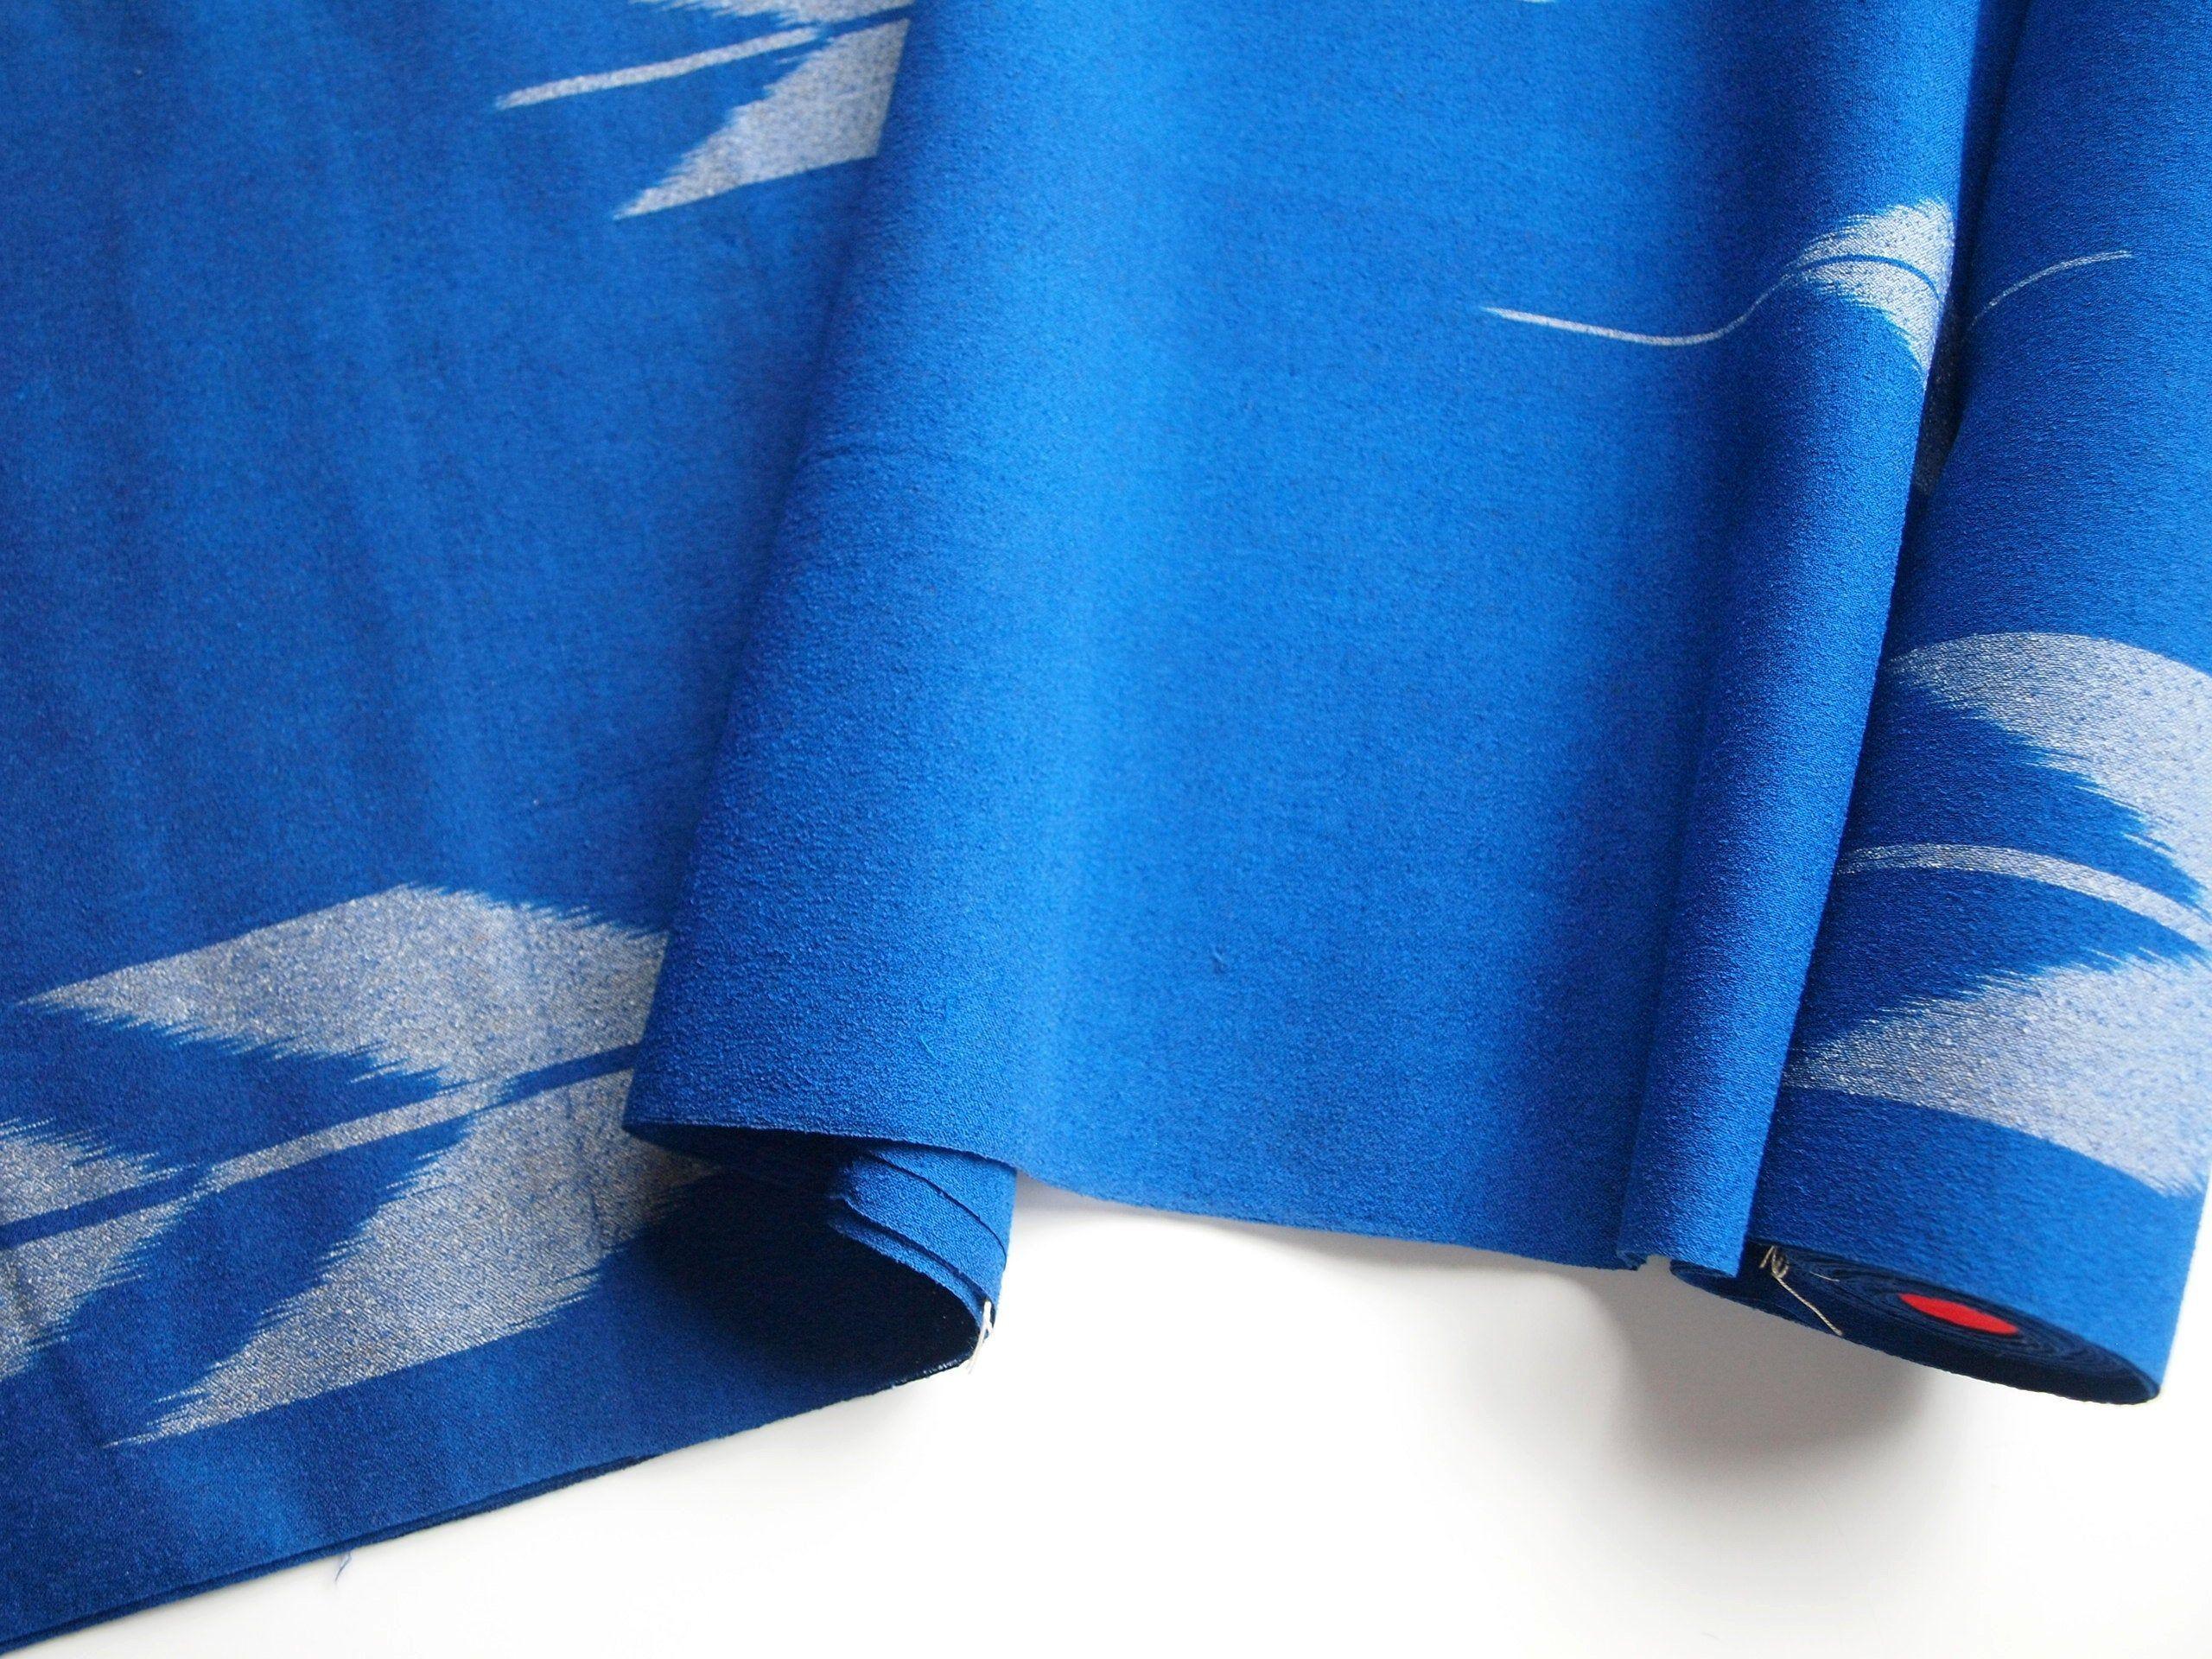 Yabane Blue Kimono Silk Vintage Japanese Silk By The Yard Etsy Japanese Silk Kimono Fabric Blue Kimono